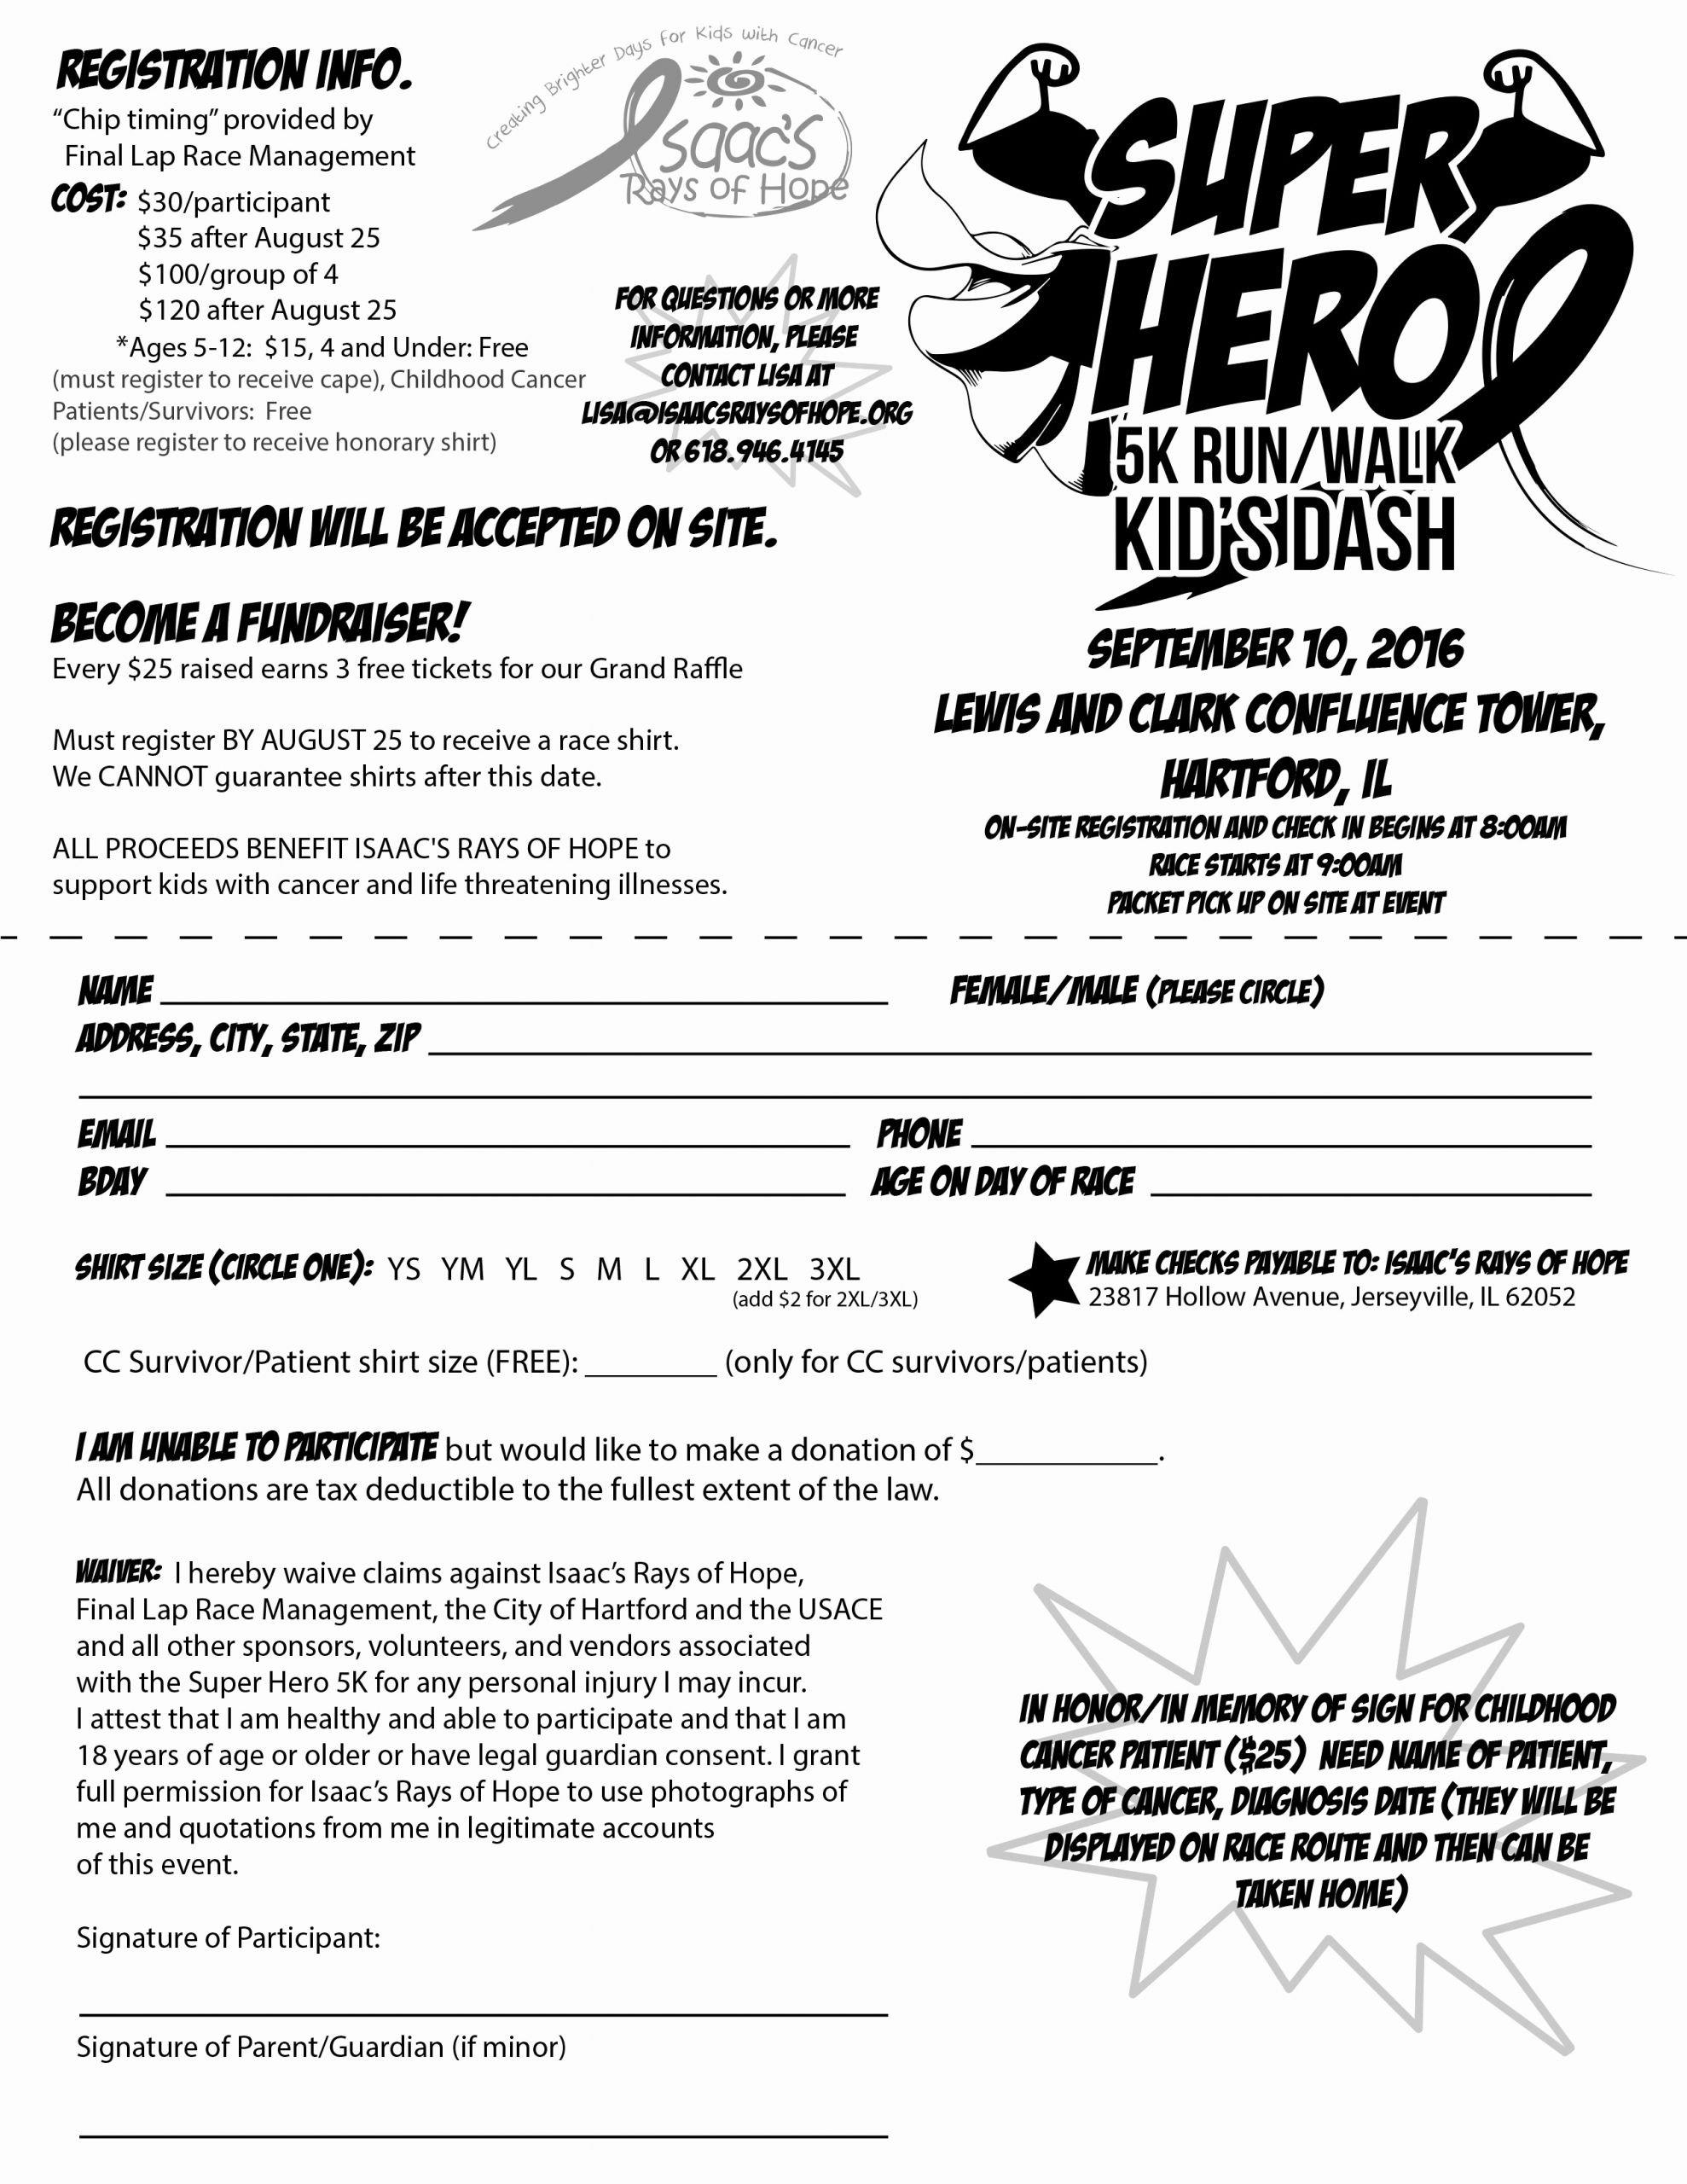 5k Registration form Template Fresh 5k Registration forms Runners Can Also Register On